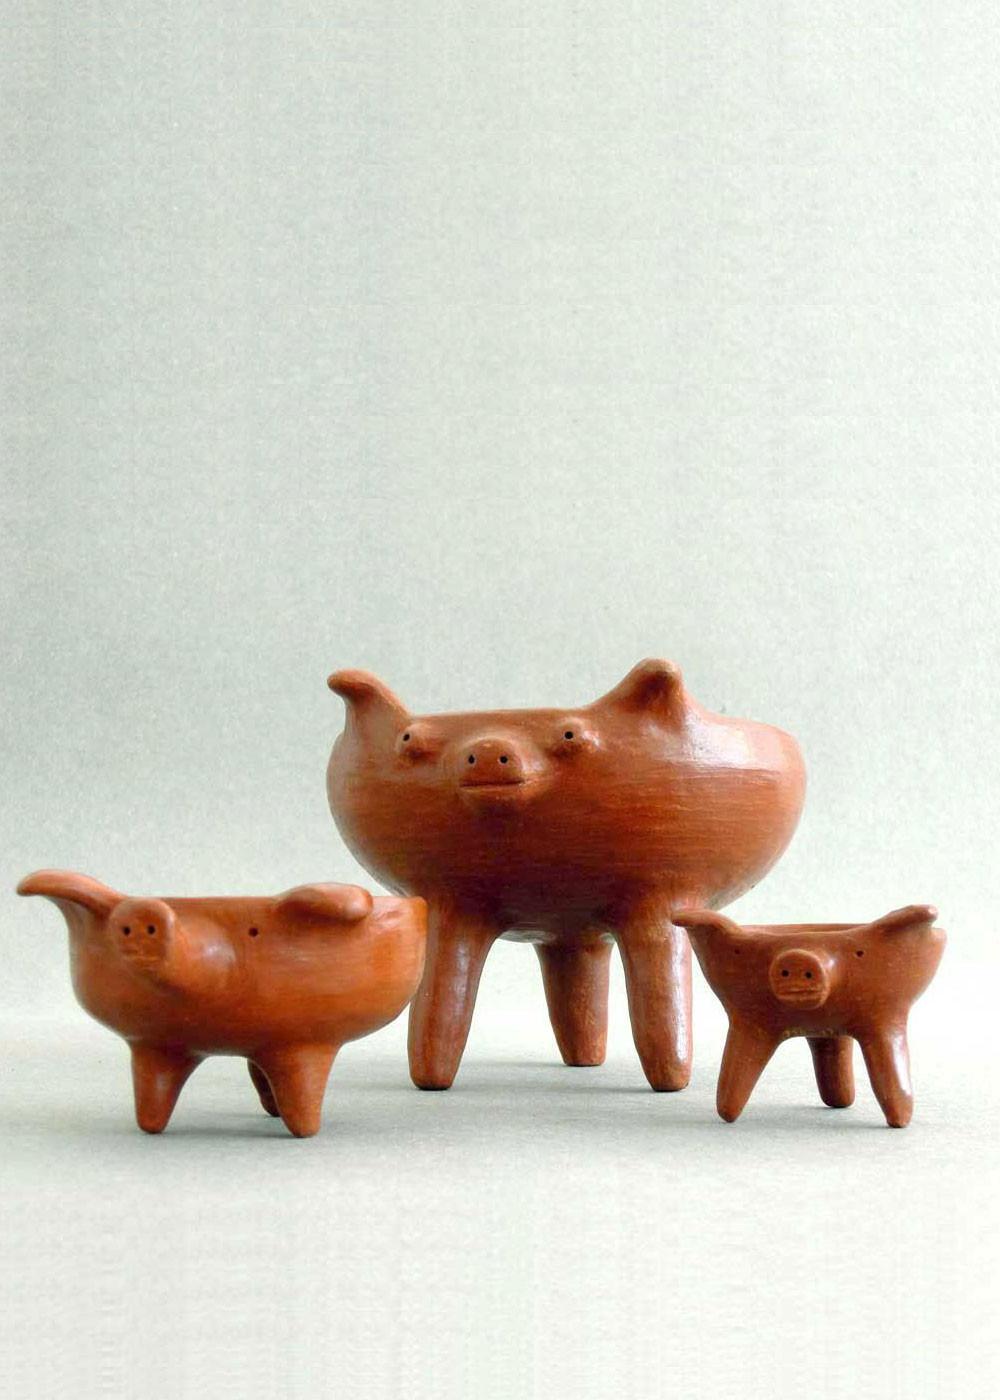 Three Little Pigs ceramic dishes